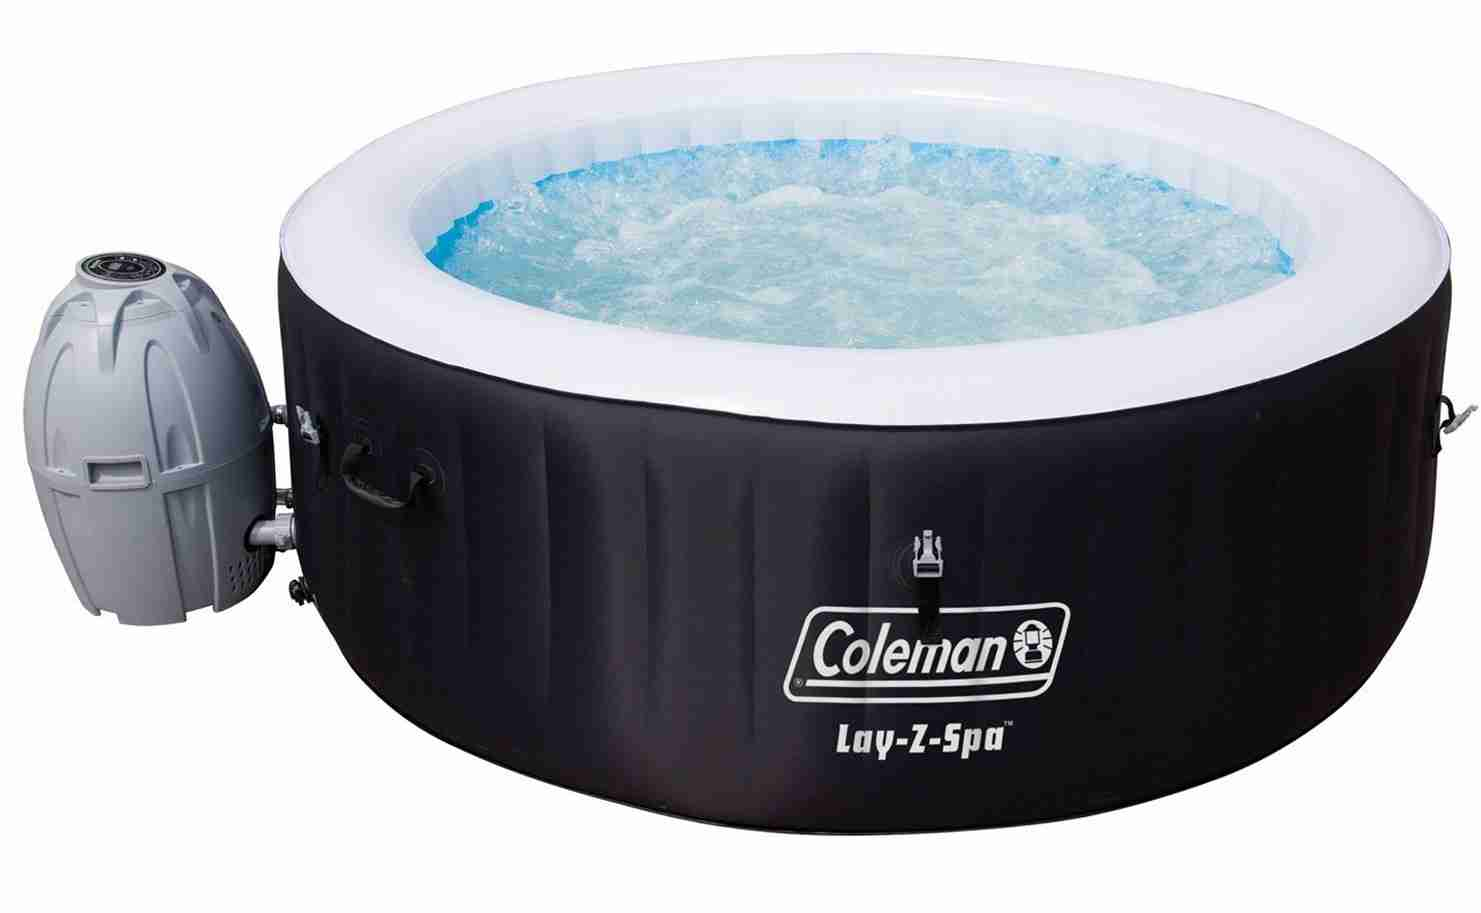 5 Cheap Hot Tubs Under $500 - Best Hot Tub Reviews